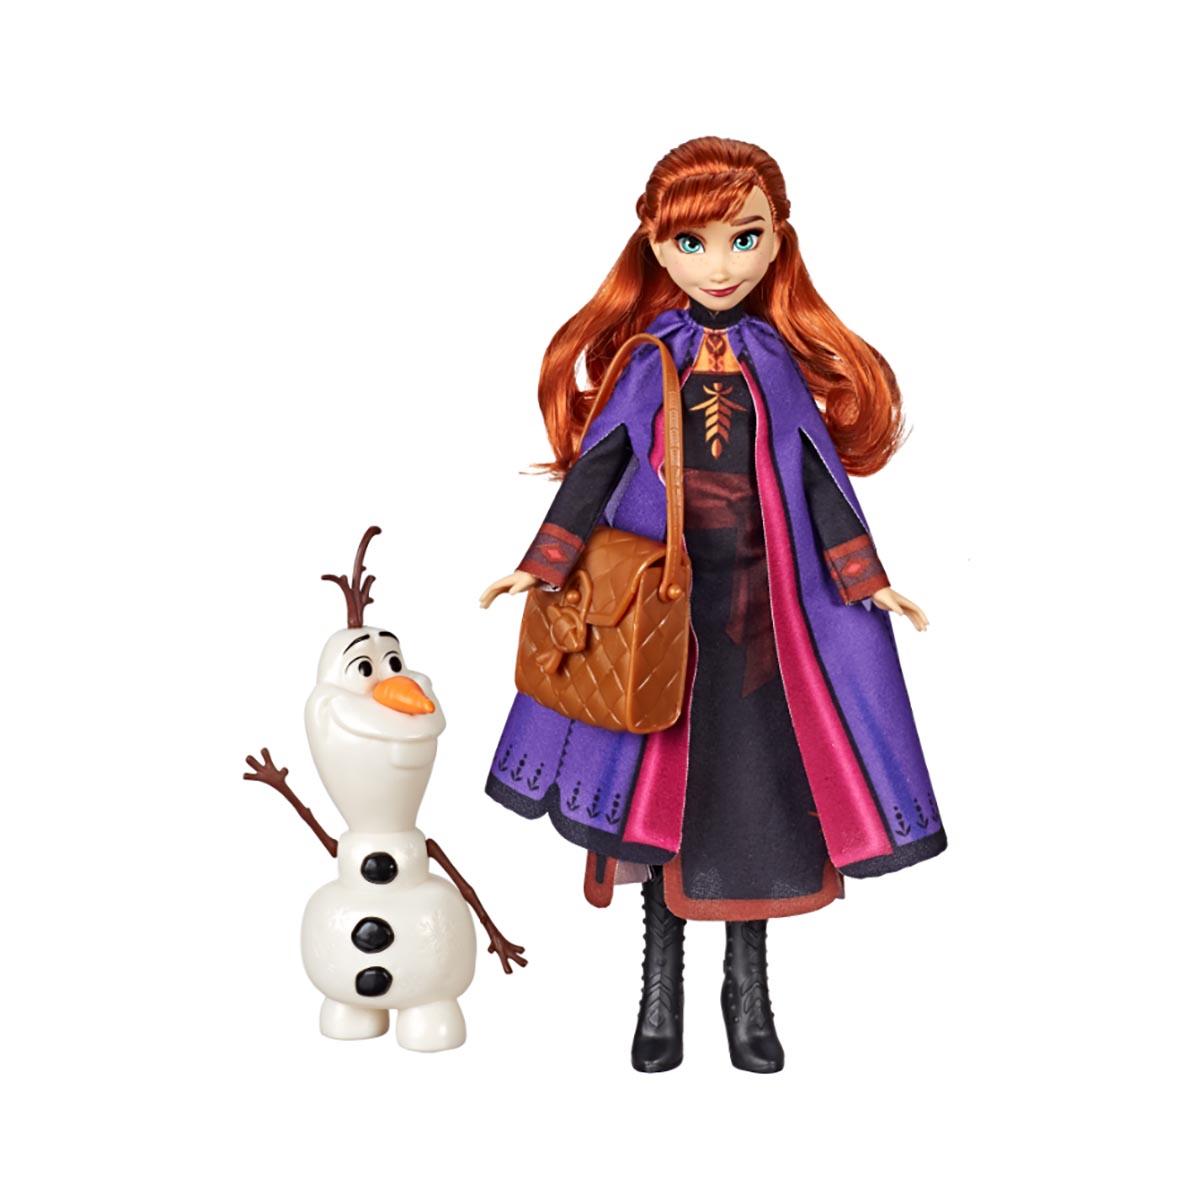 Papusa Anna cu accesorii Disney Frozen 2